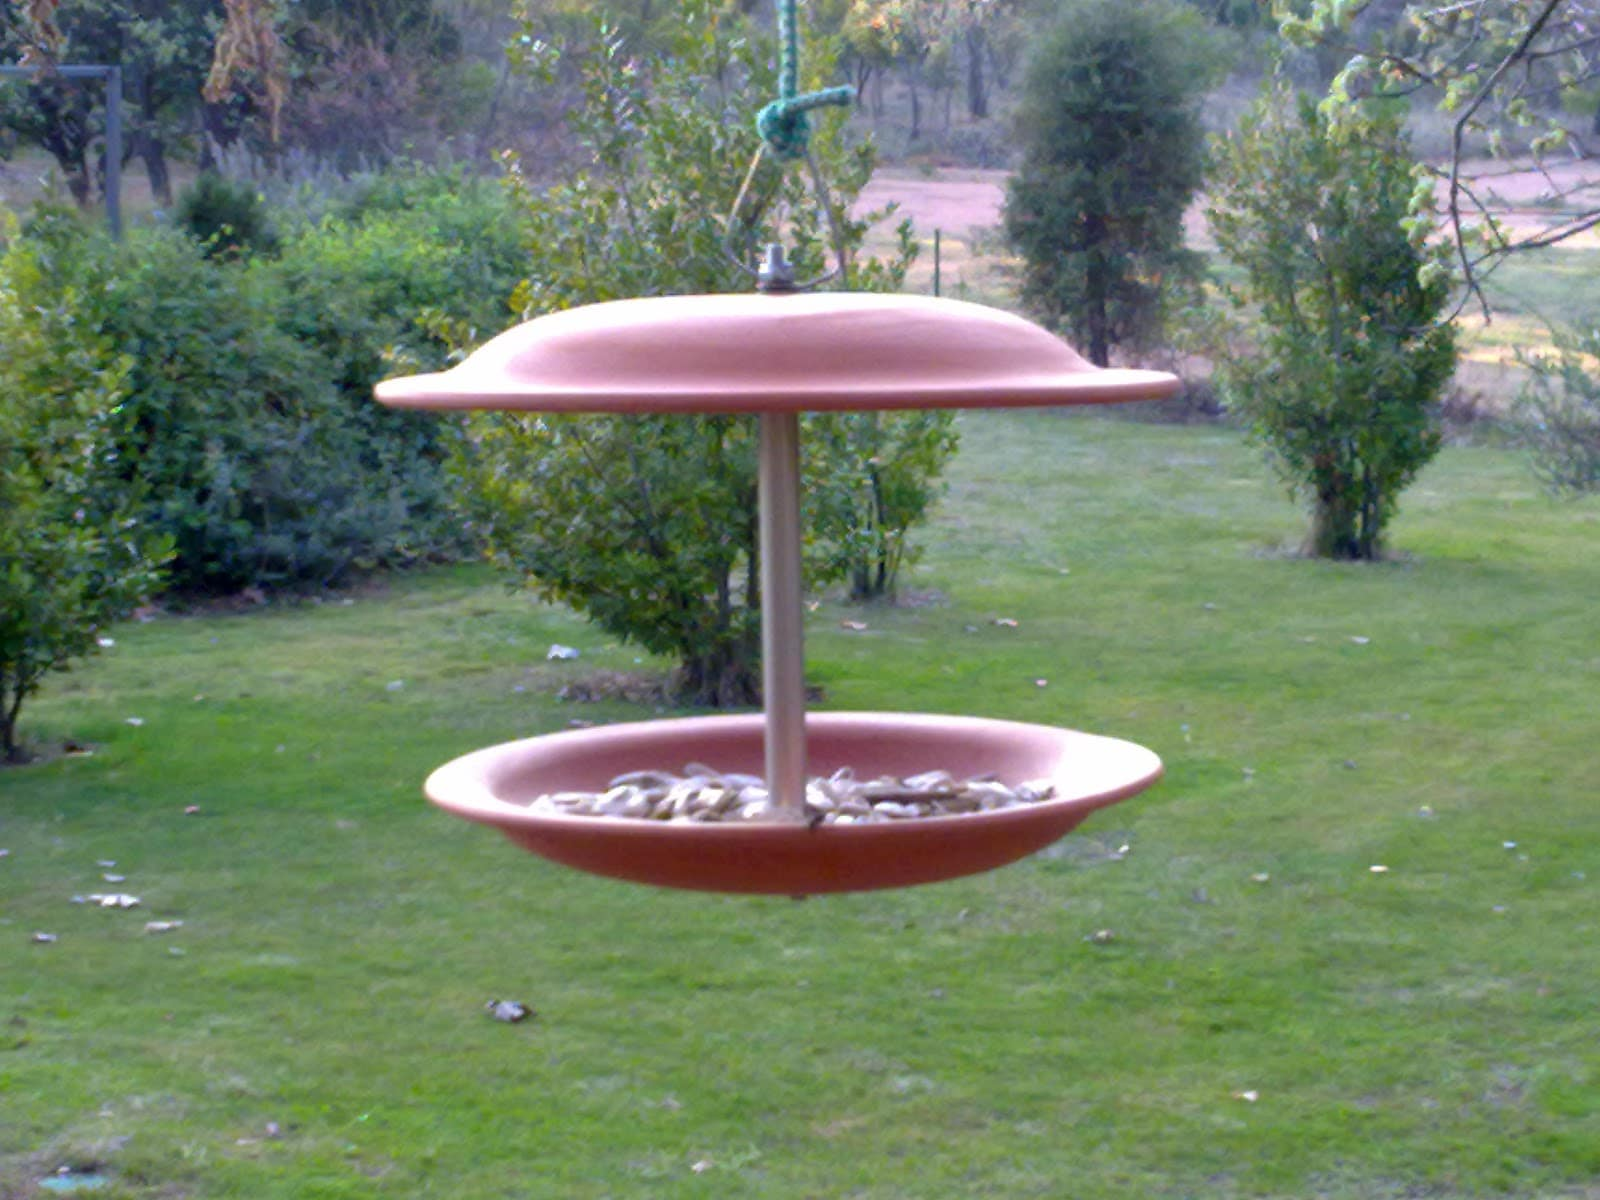 Fabrica tu propio comedero de mariposas la huertina de toni for Bebederos para aves jardin